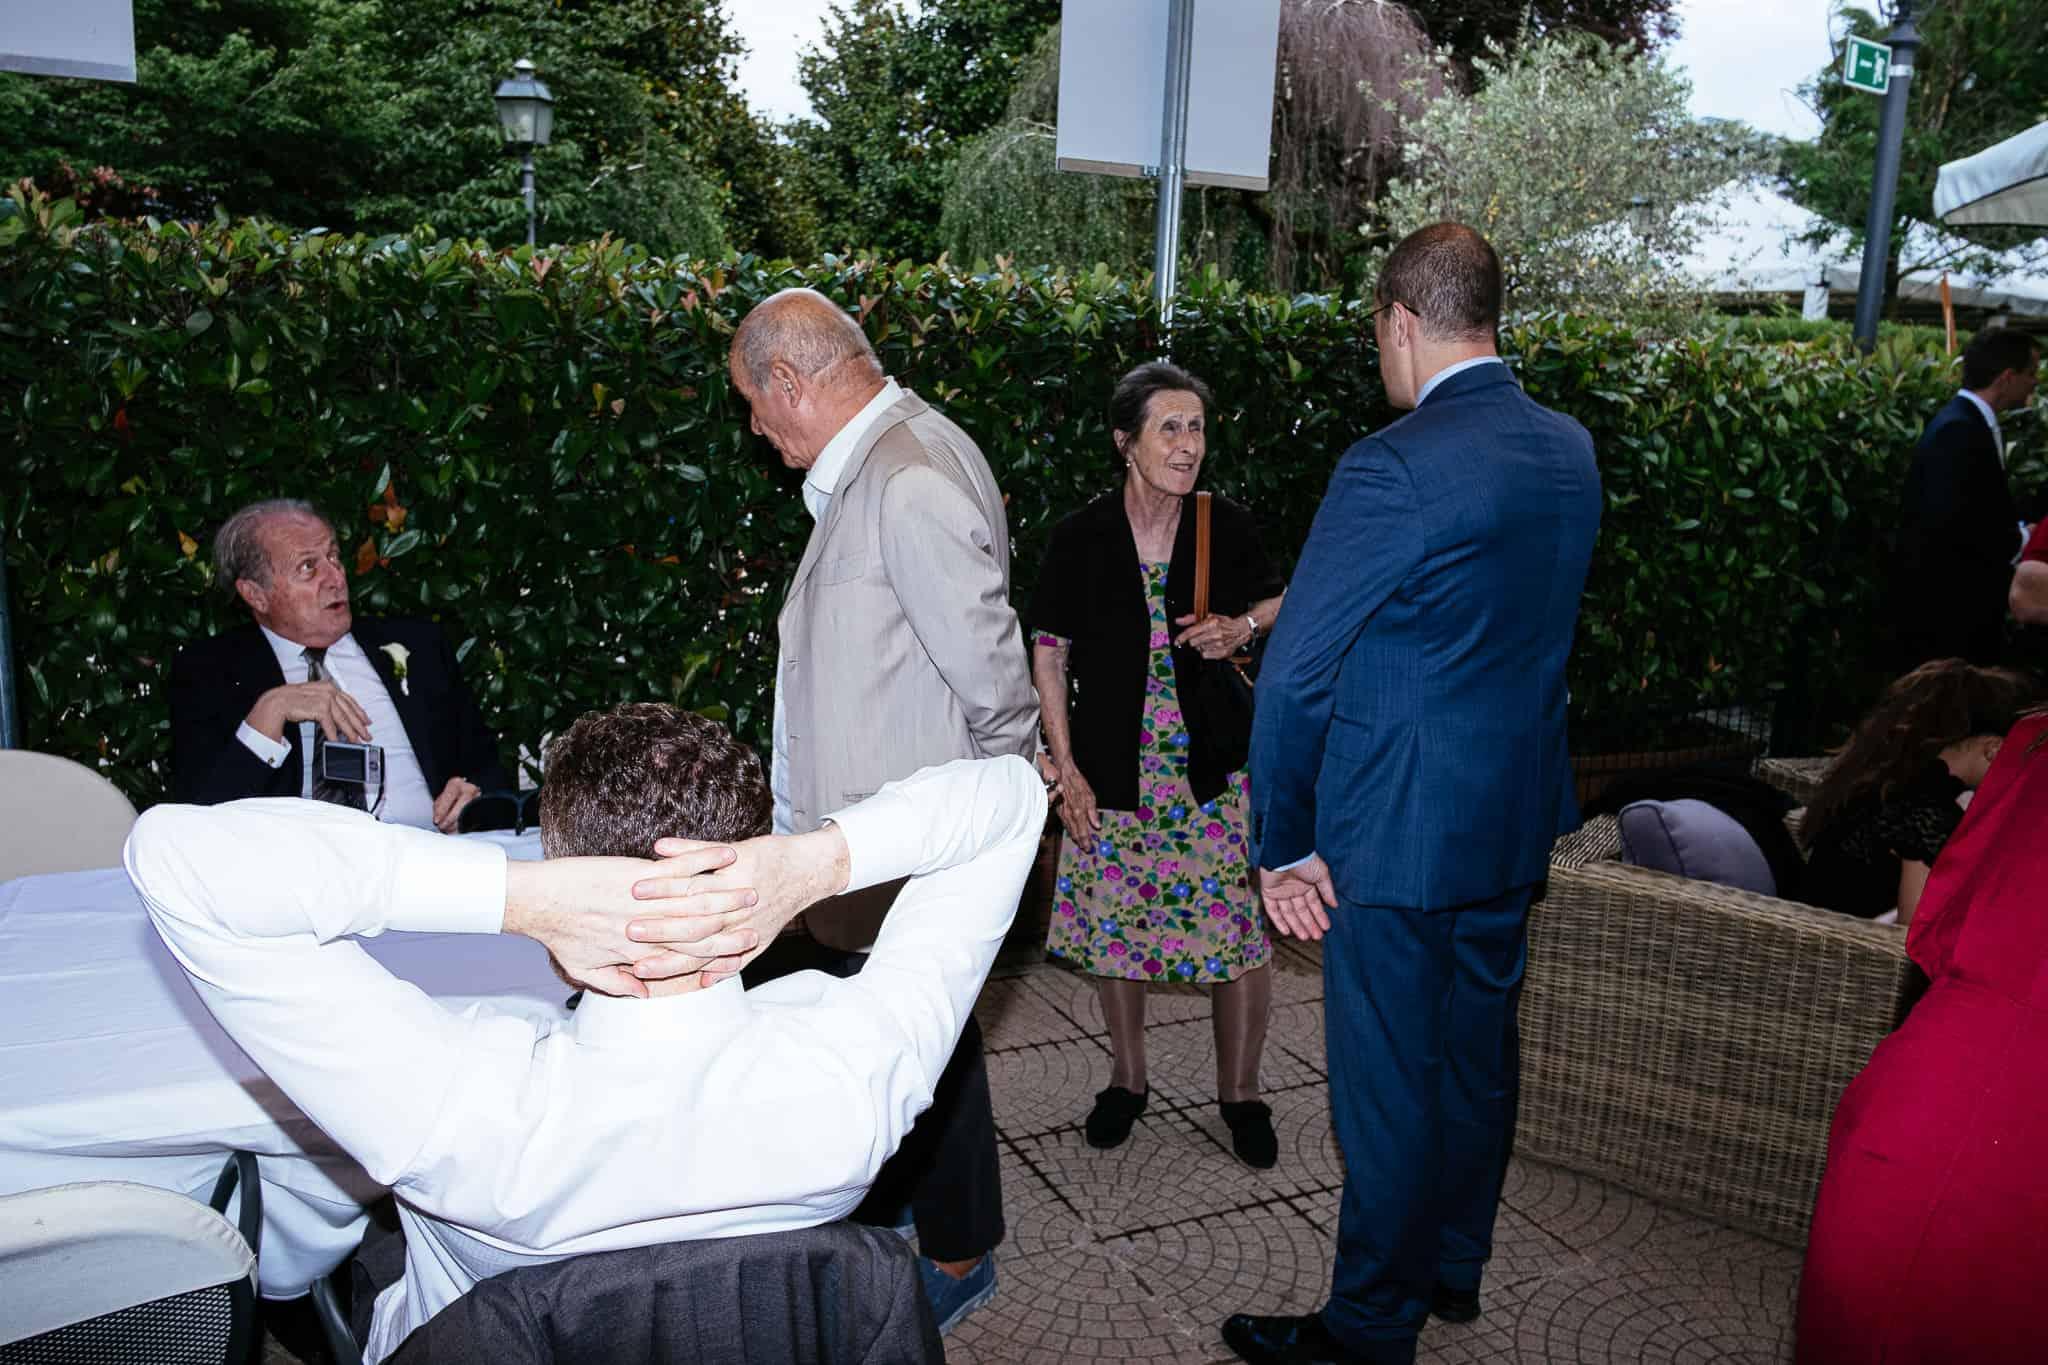 matrimonio Canter Milano San siro Luca rossi wedding reportage 0052